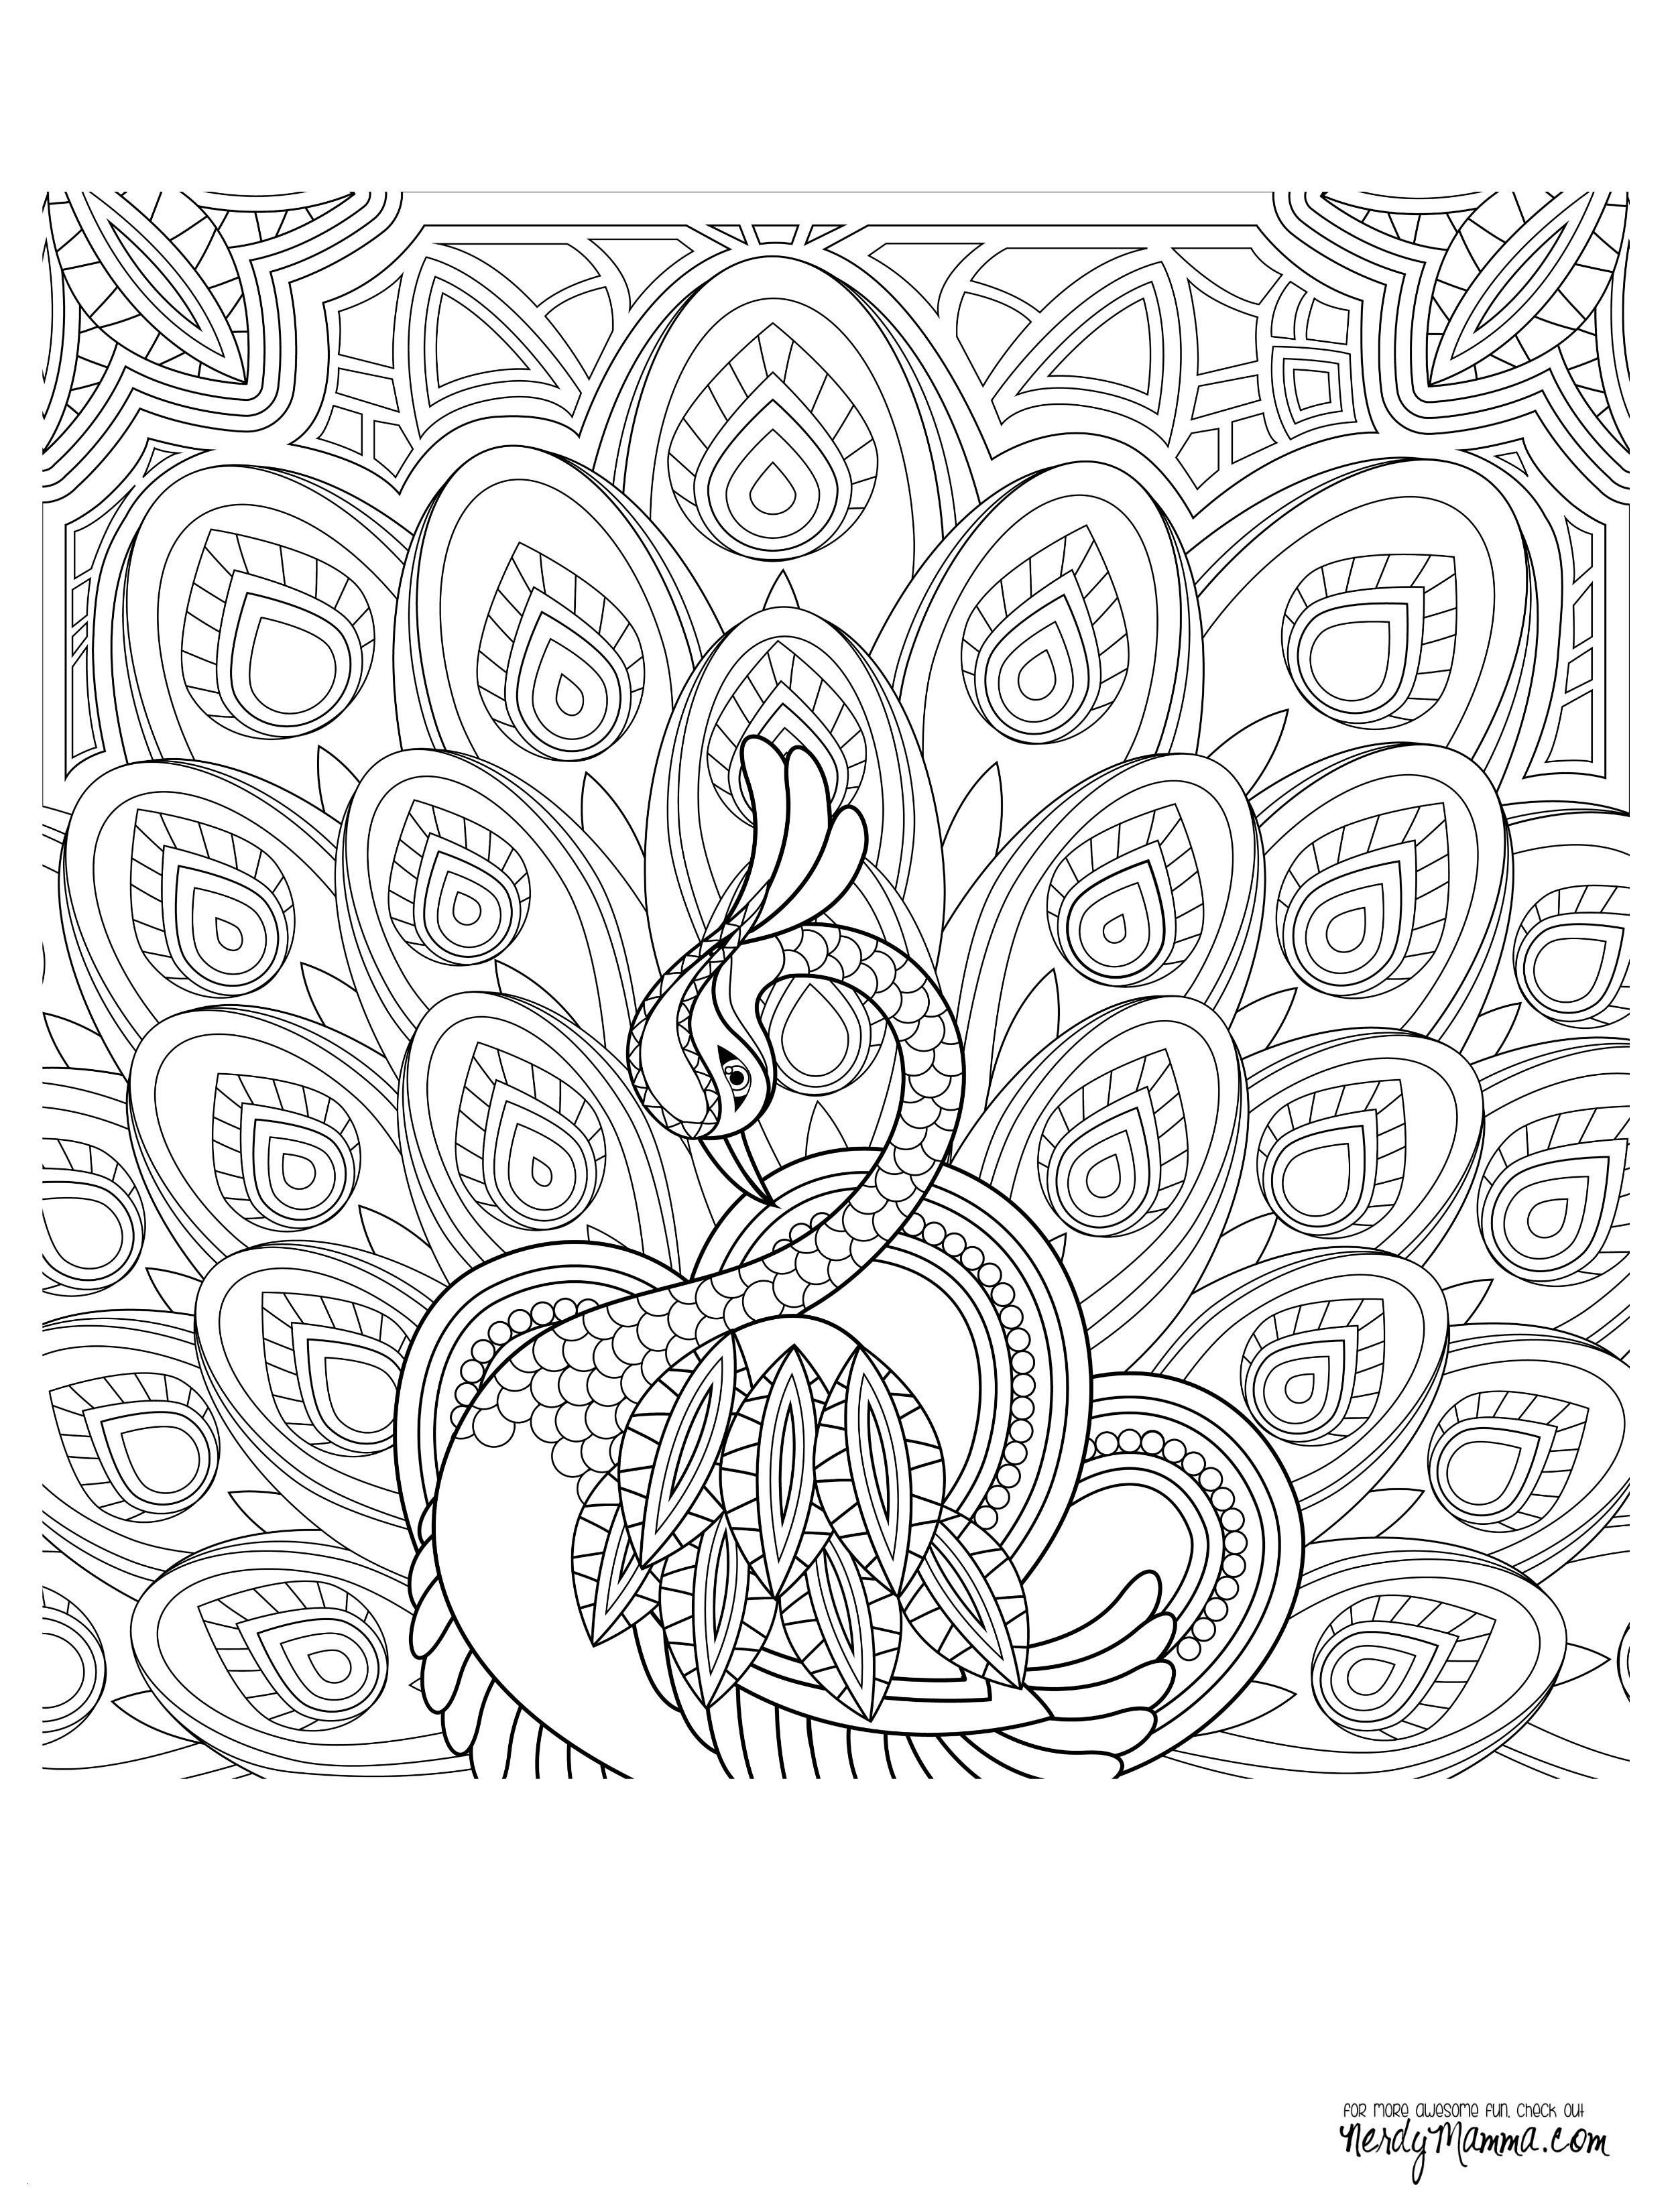 Eulen Auf ast Malvorlagen Genial Eule Malvorlagen Pdf Exzellente 40 Malvorlagen Mandala Scoredatscore Stock